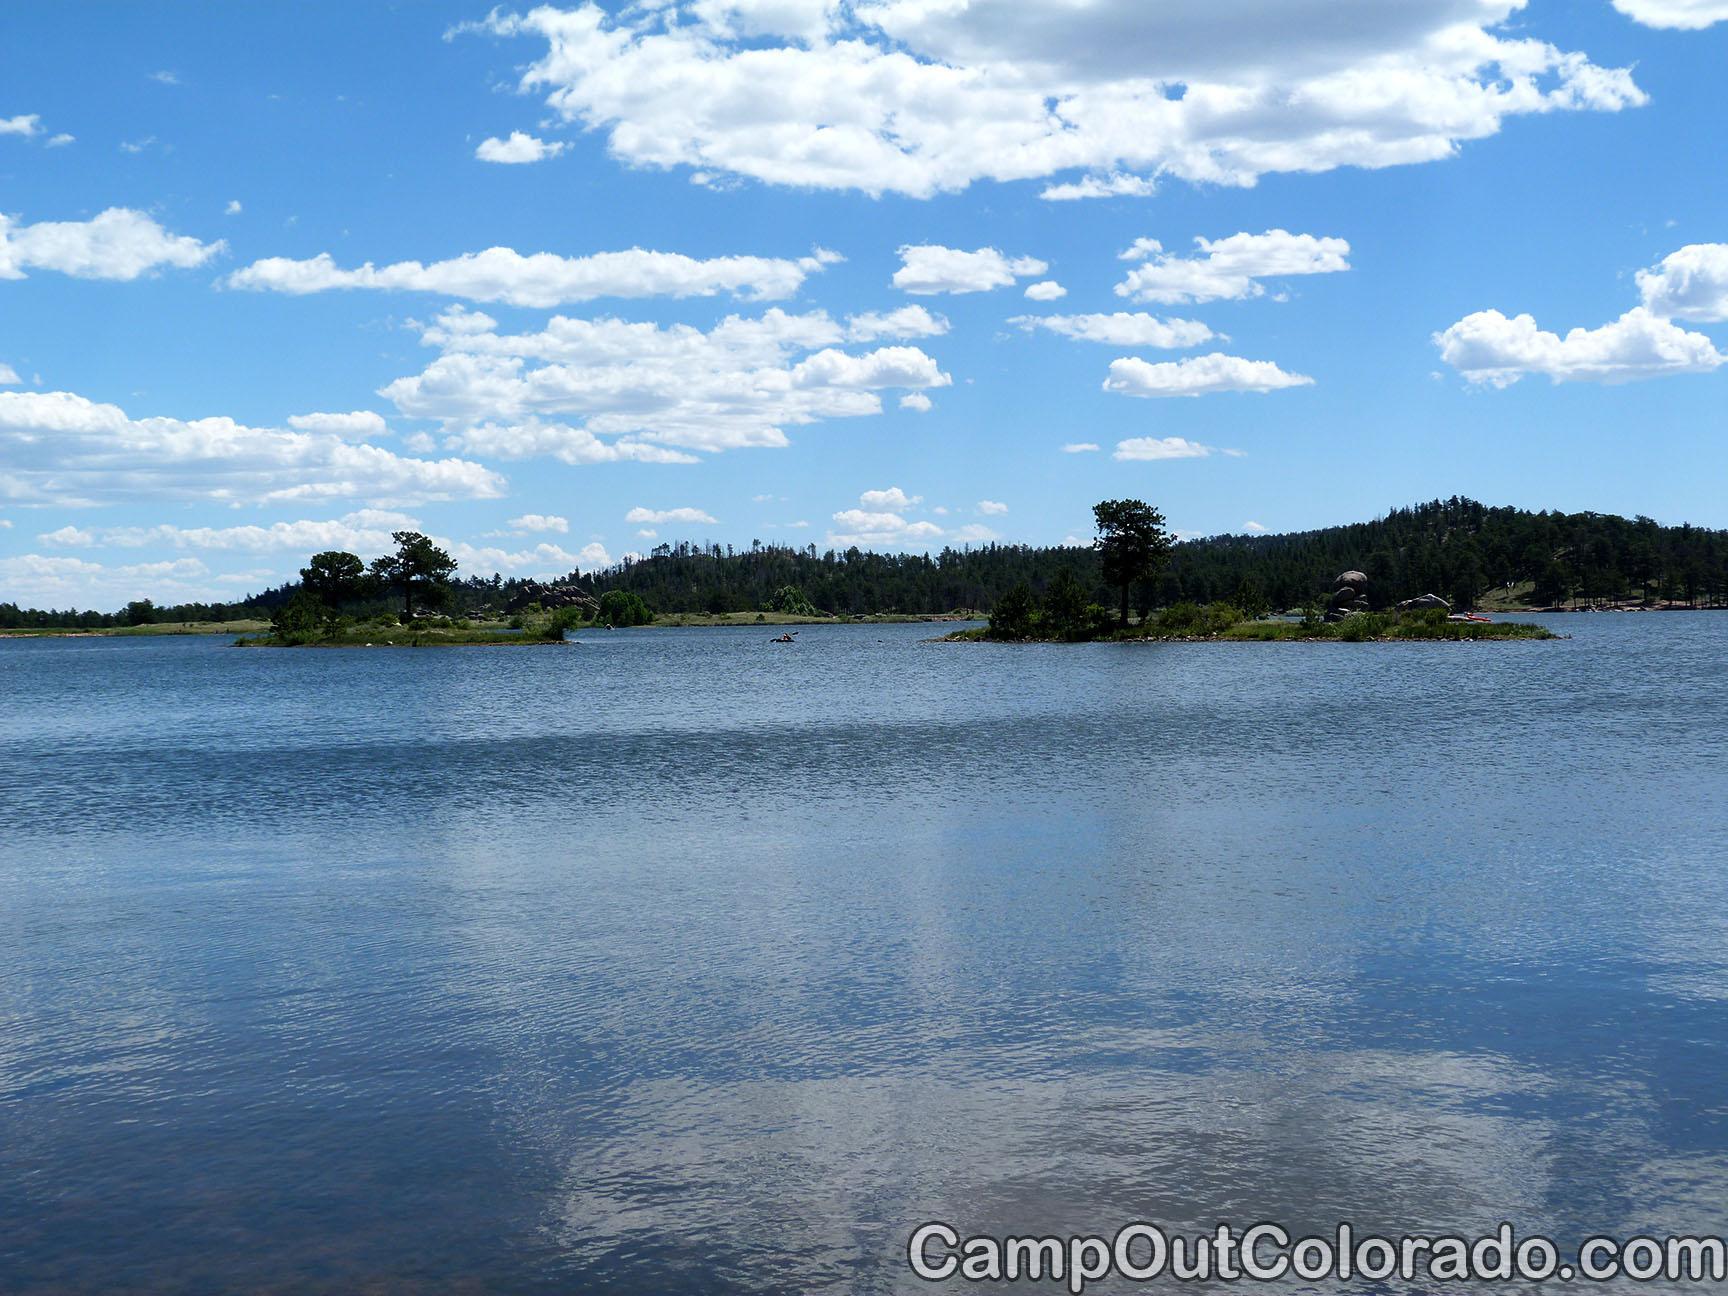 Campoutcolorado-dowdy-lake-campground-beware-shallow